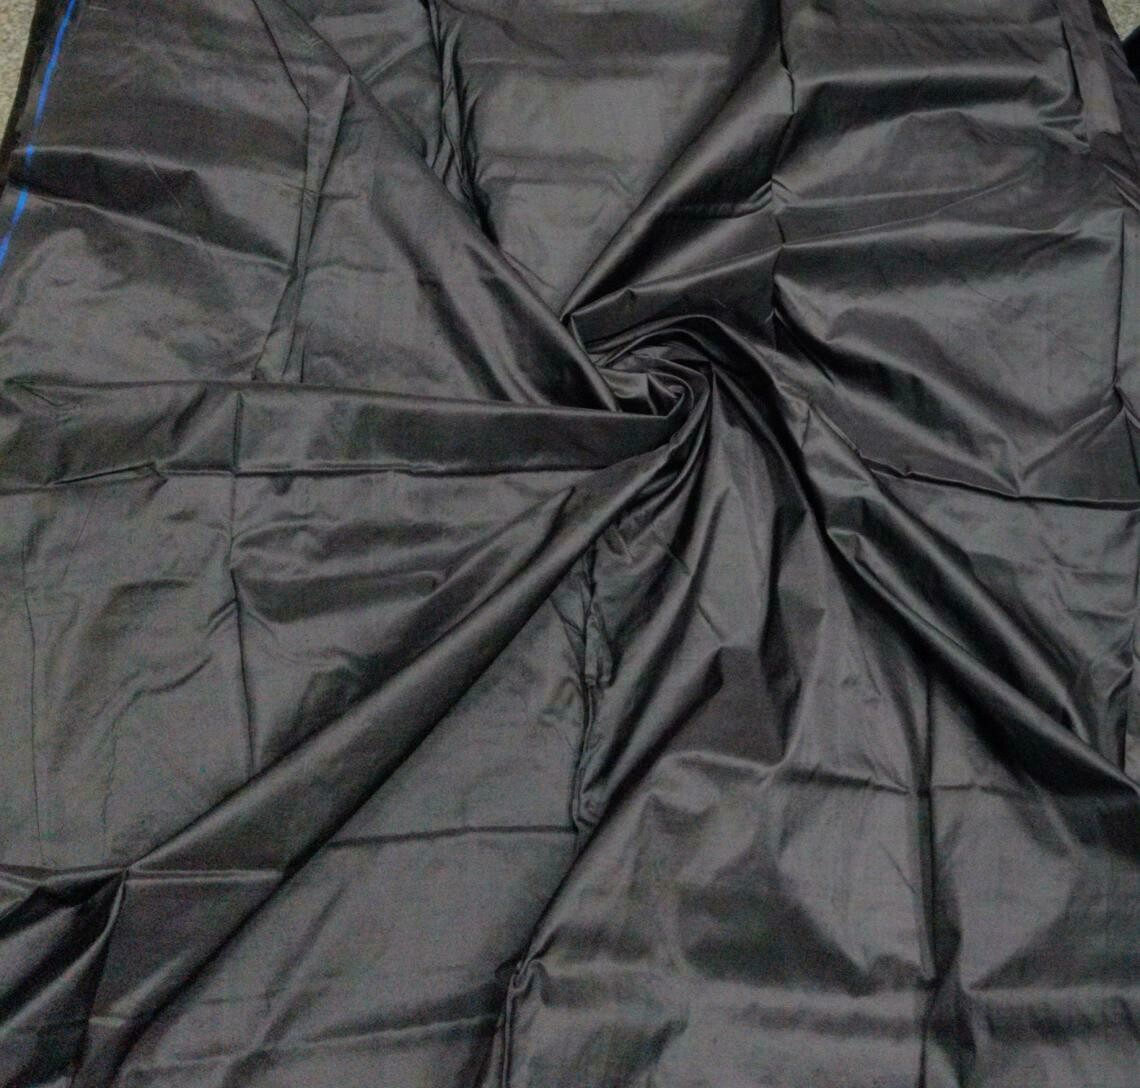 Black Mulberry Silk Fabric/100% Pure Silk Fabric, Plain silk fabric made with Hand Woven